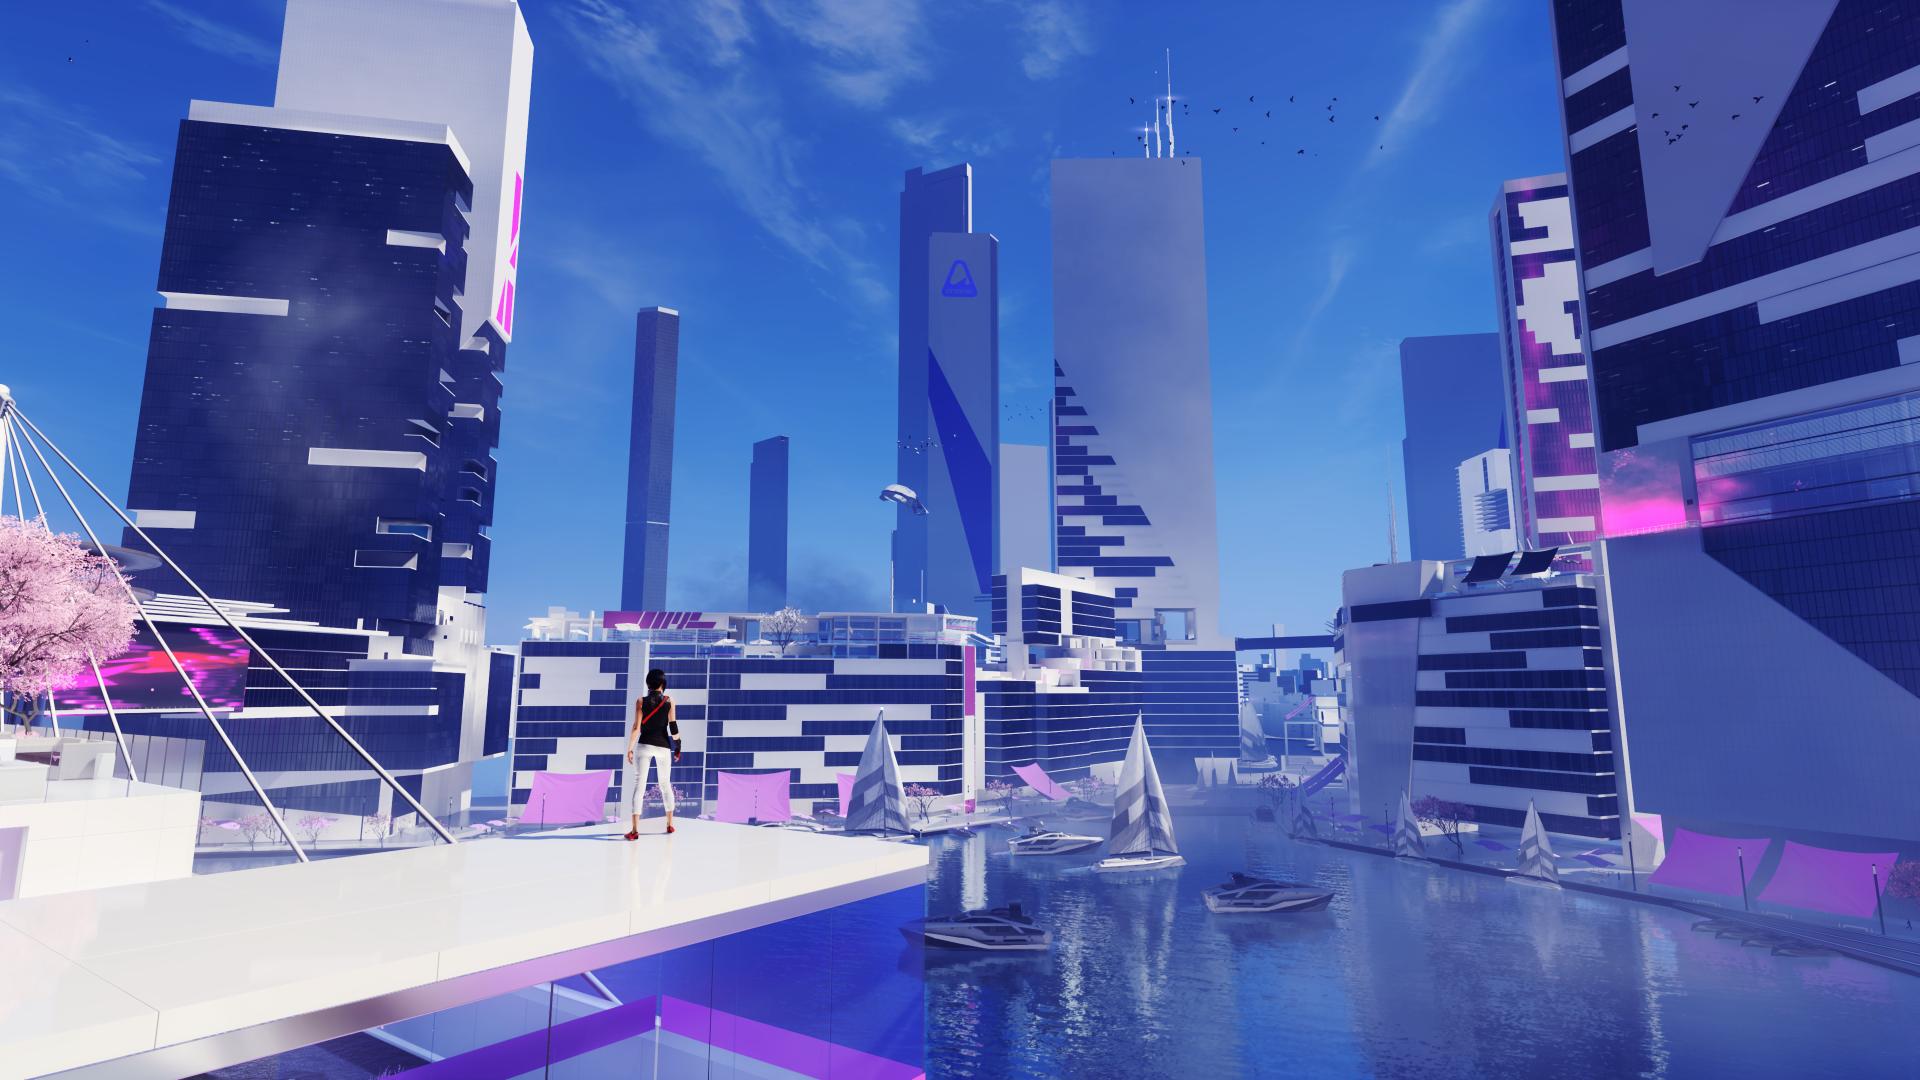 Mirror's Edge Catalyst 4k Ultra HD Wallpaper | Background ...